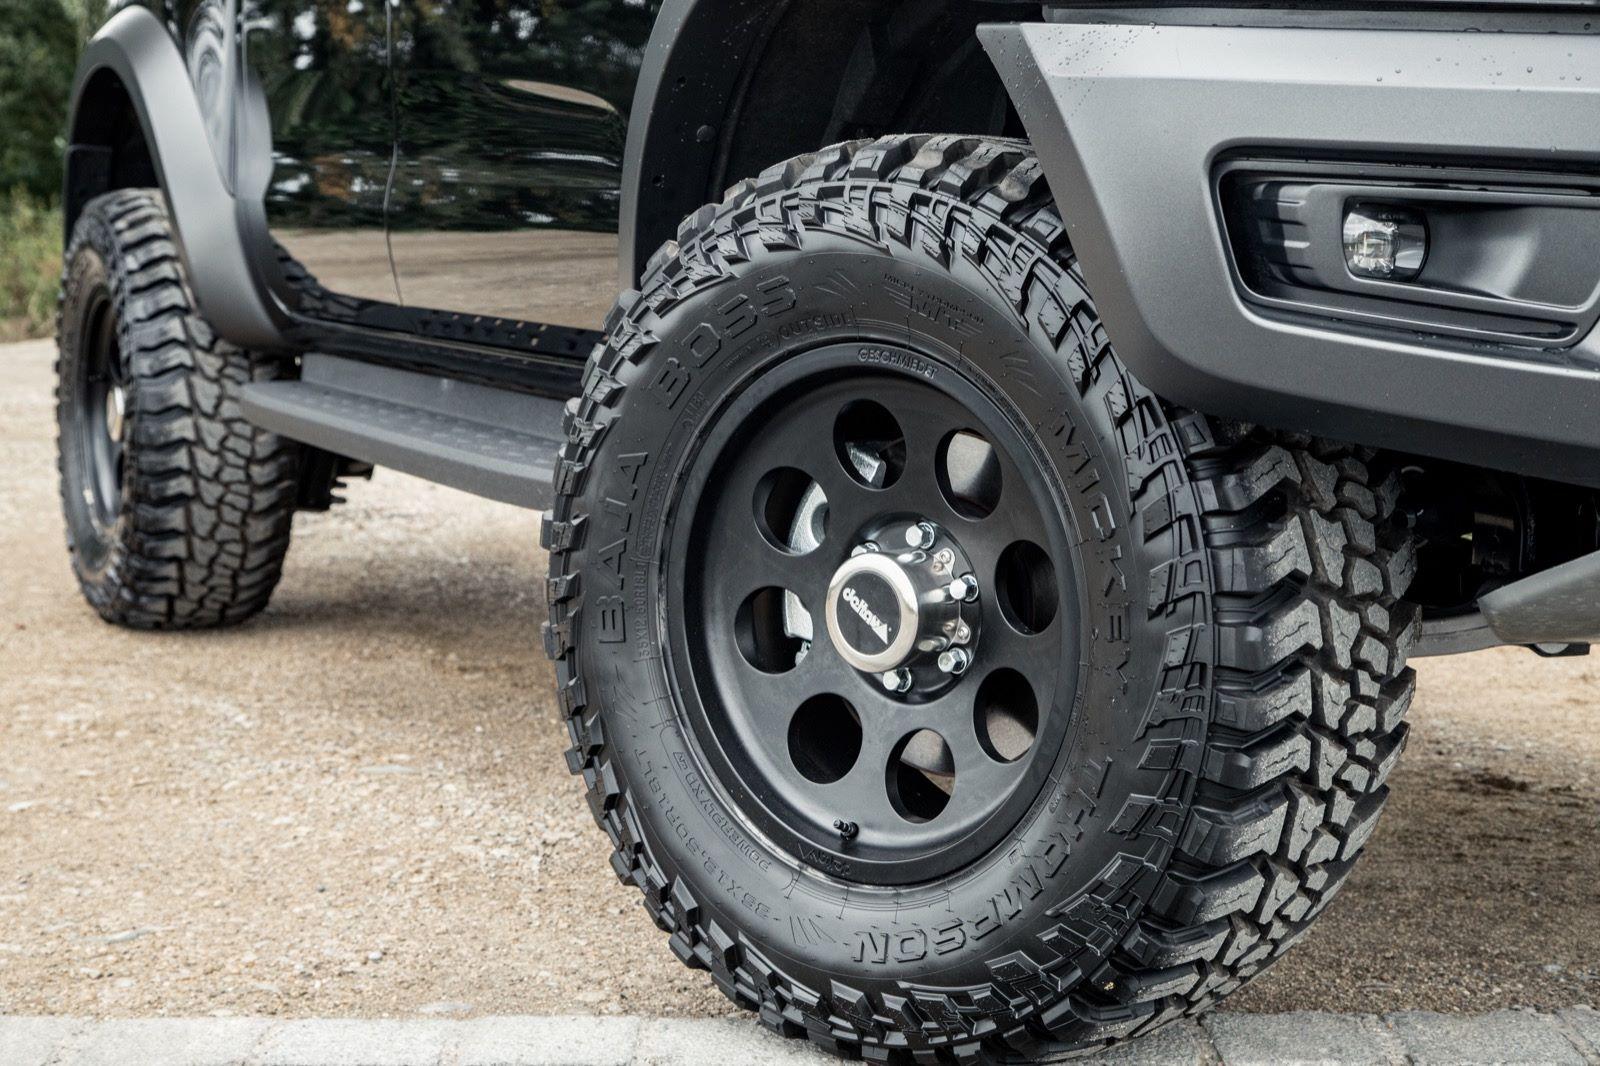 Ford-Ranger-Raptor-by-Delta-4x4-14